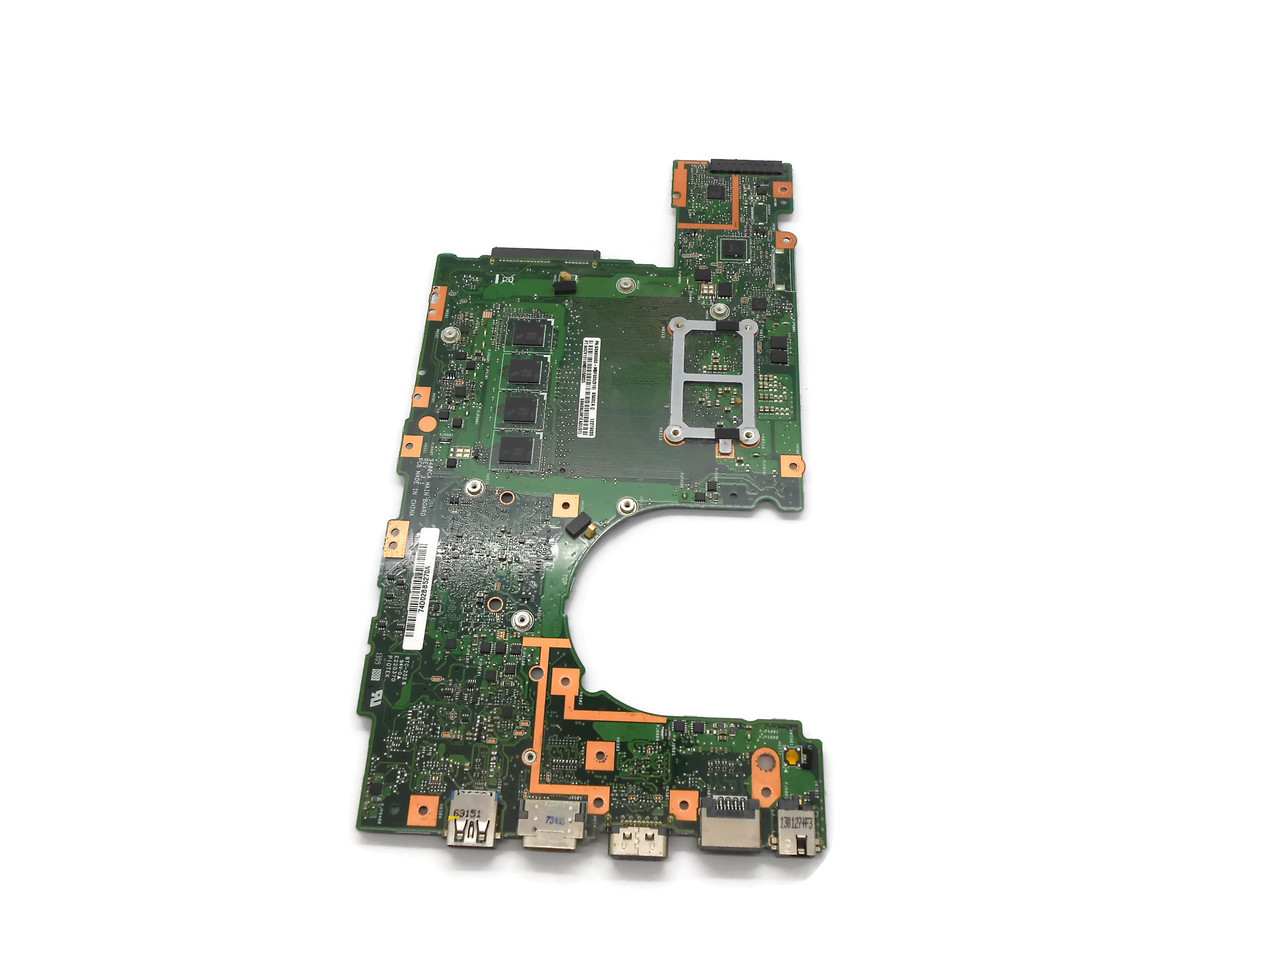 60NB0060-MBC000 Asus S500CA Laptop Motherboard w// Intel i3-3217U 1.8GHz CPU